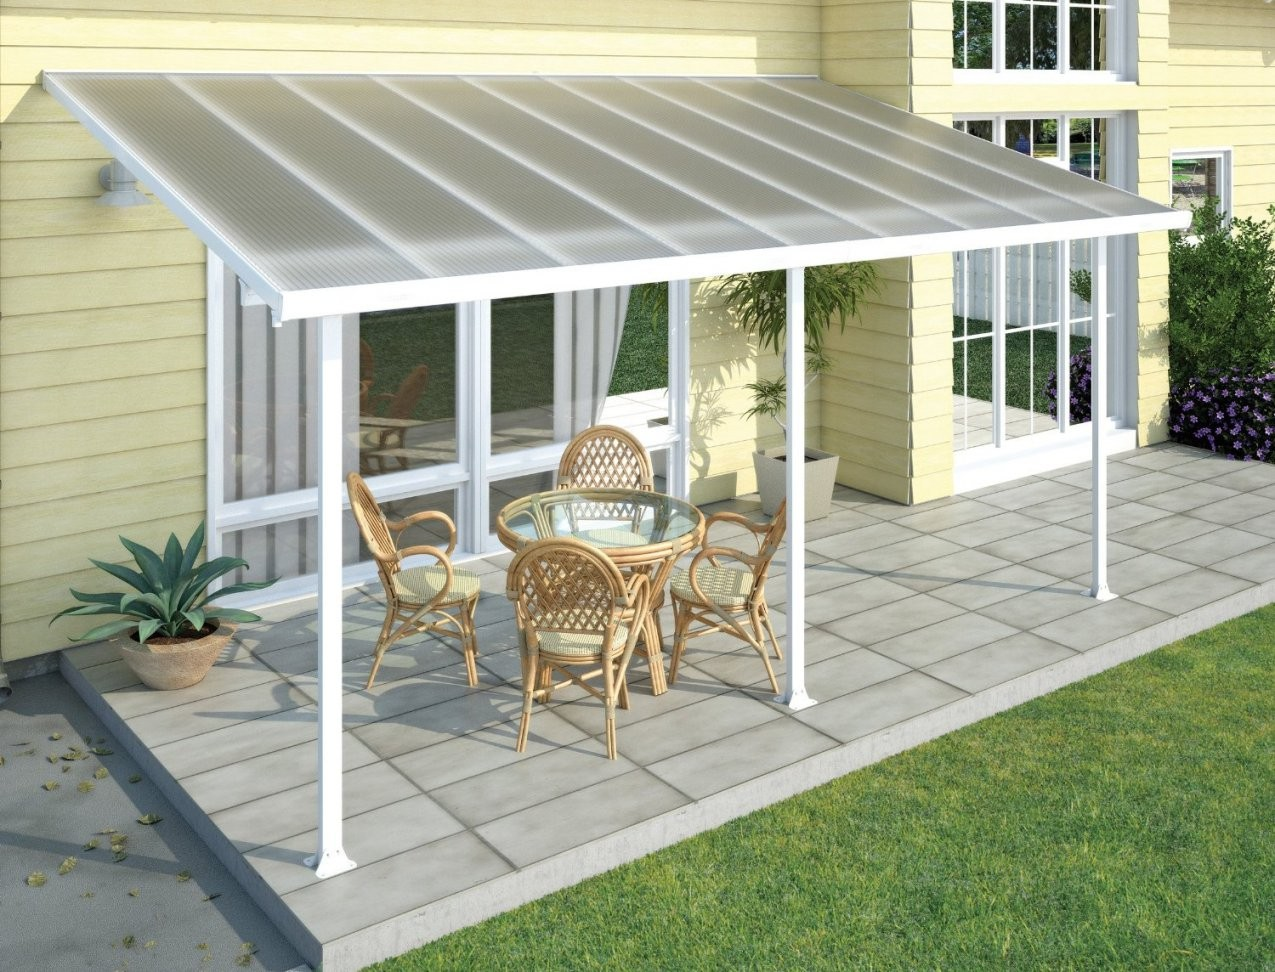 20 terrassen berdachung holz freistehend planen terrassen berdachung von terrassen berdachung. Black Bedroom Furniture Sets. Home Design Ideas